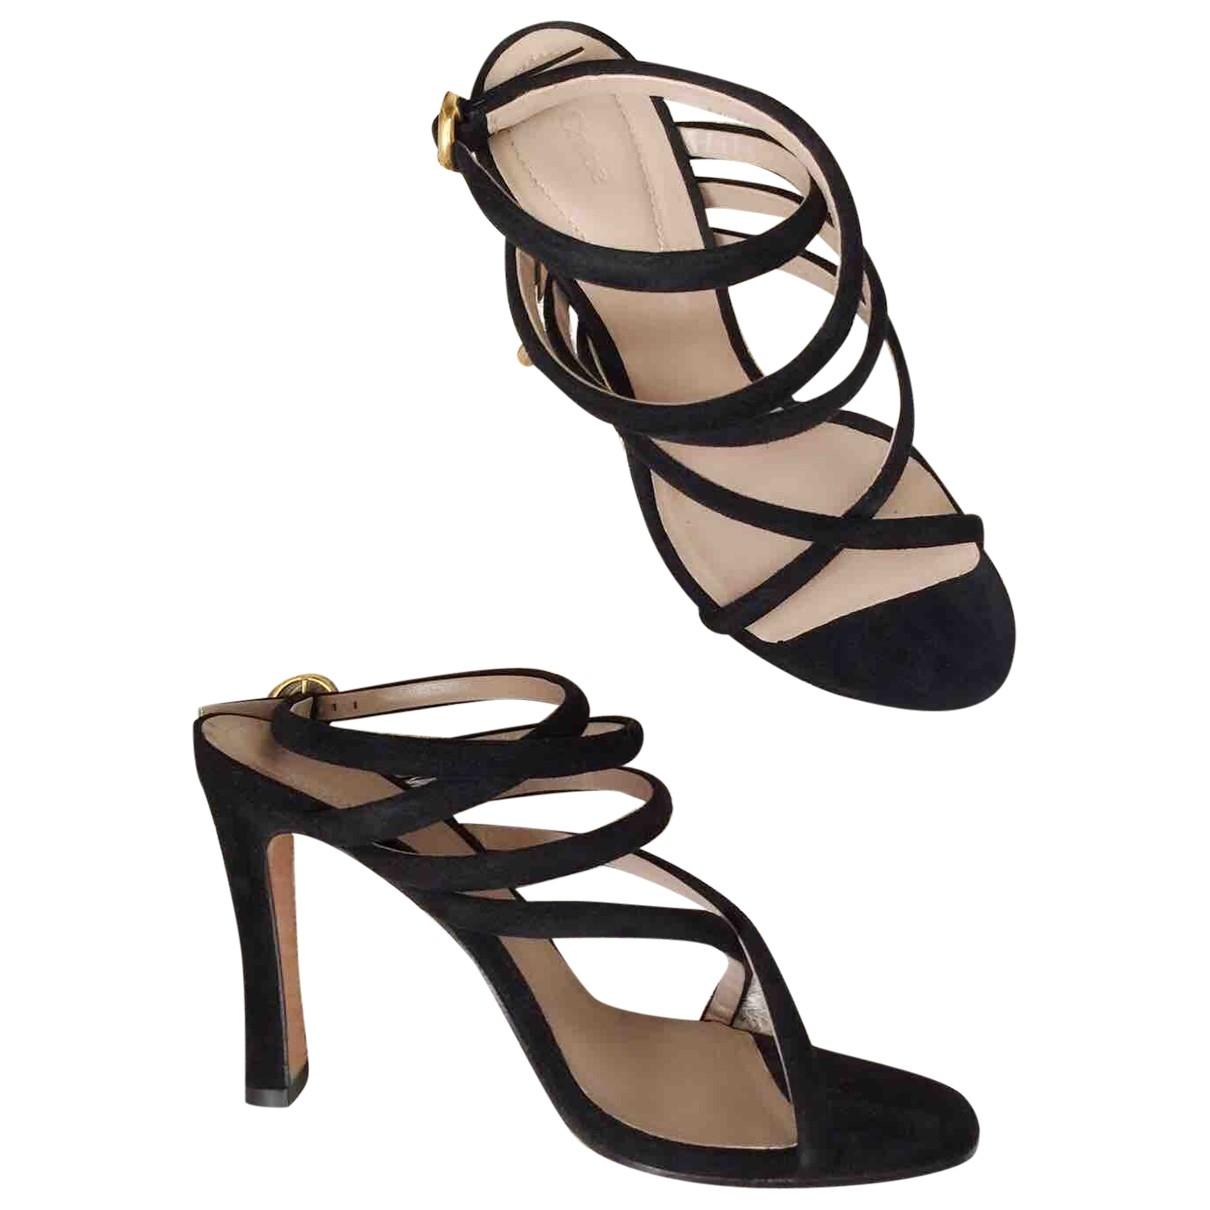 Chloé \N Black Leather Sandals for Women 37 EU